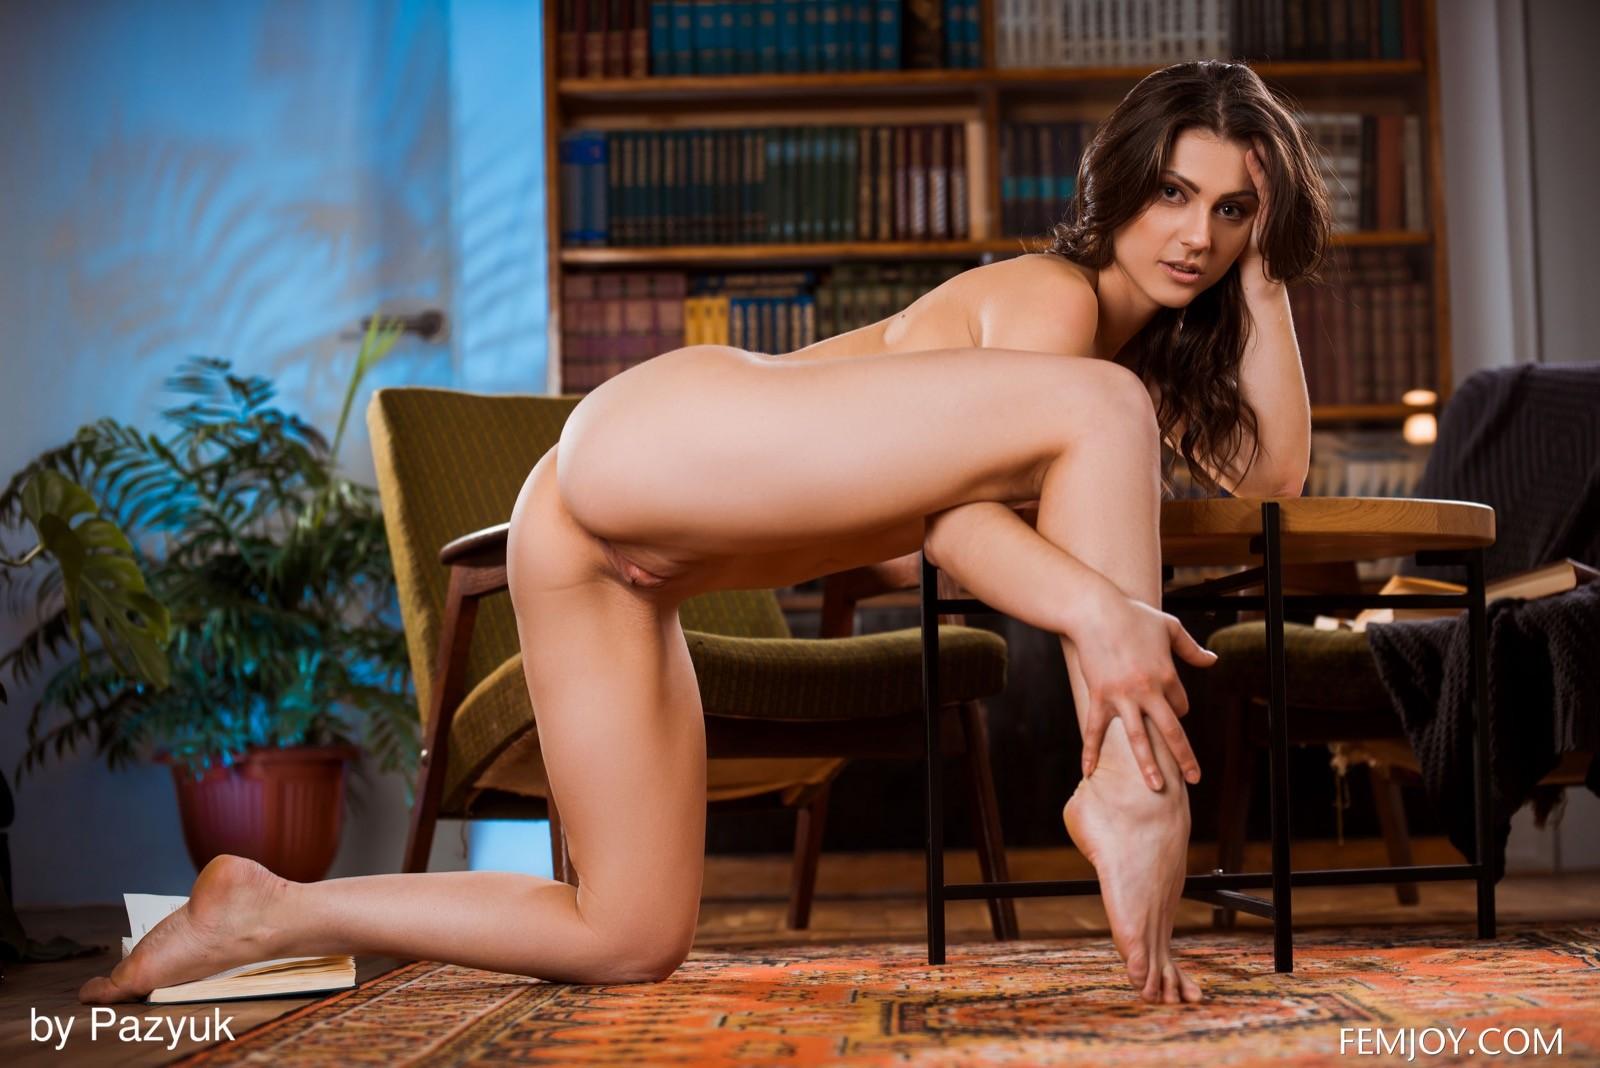 Студентка раздвигает ноги на полу - фото